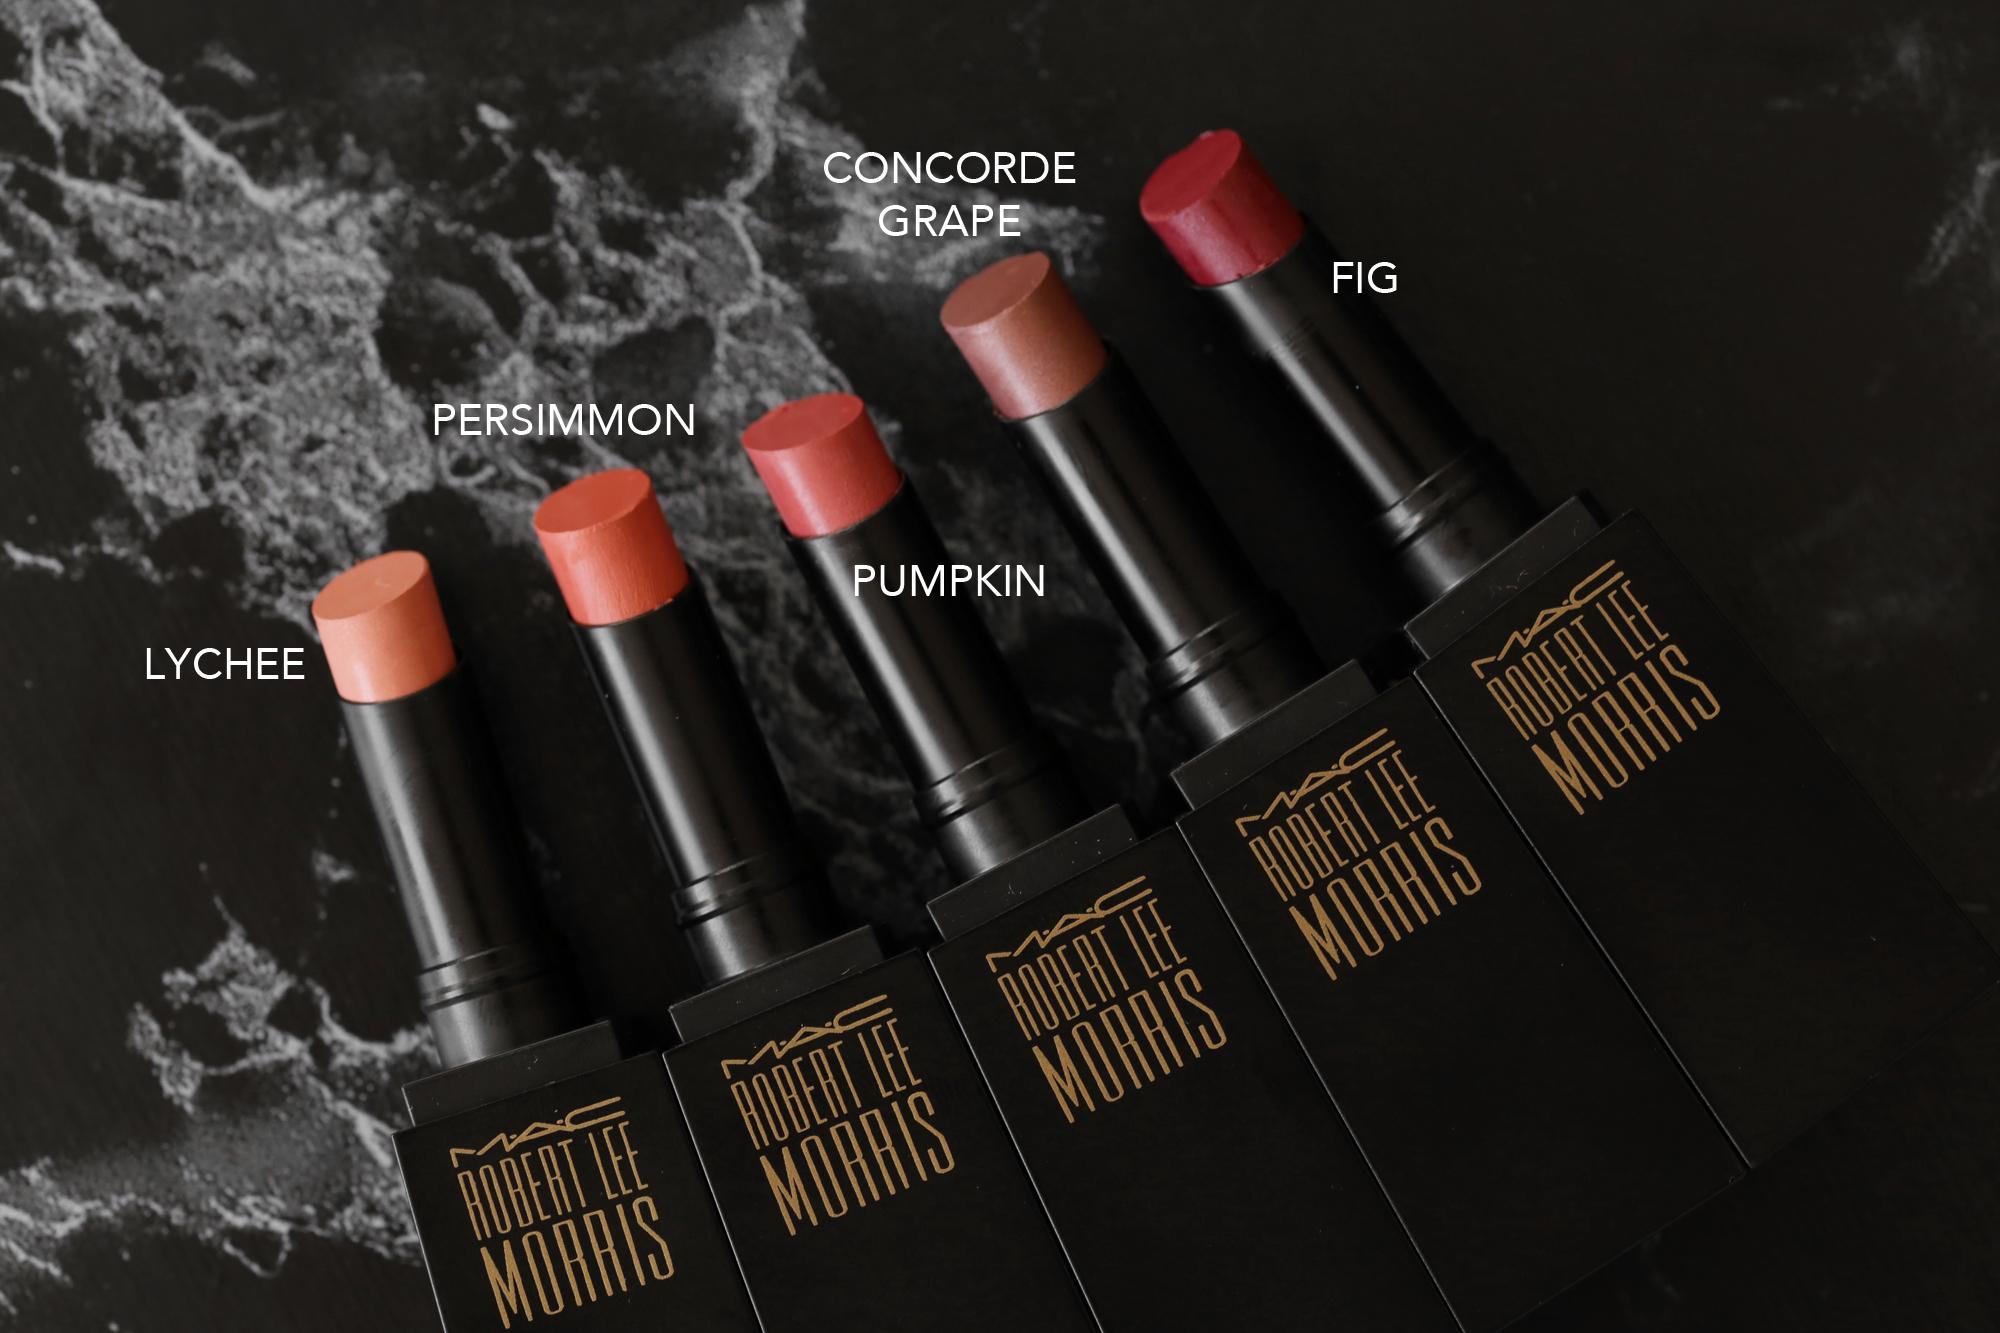 MAC x Robert Lee Morris makeup collection 2017 lipstick, blush, powder, compact, brush, beauty_5398 copy.jpg